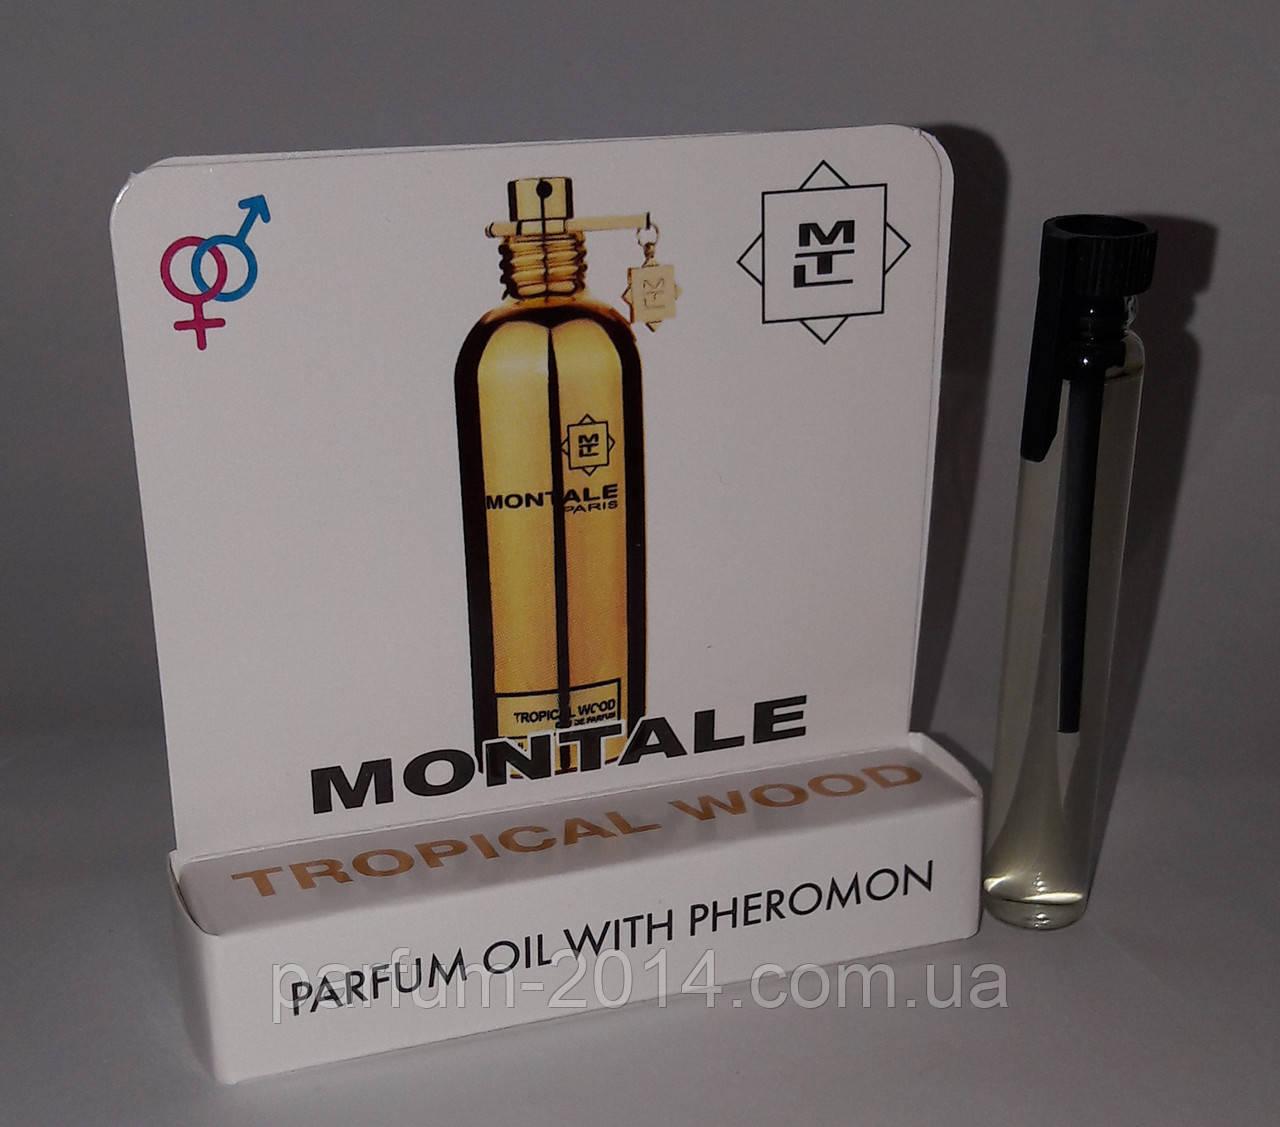 Масляные духи с феромонами Montale Tropical Wood 5 ml (реплика)